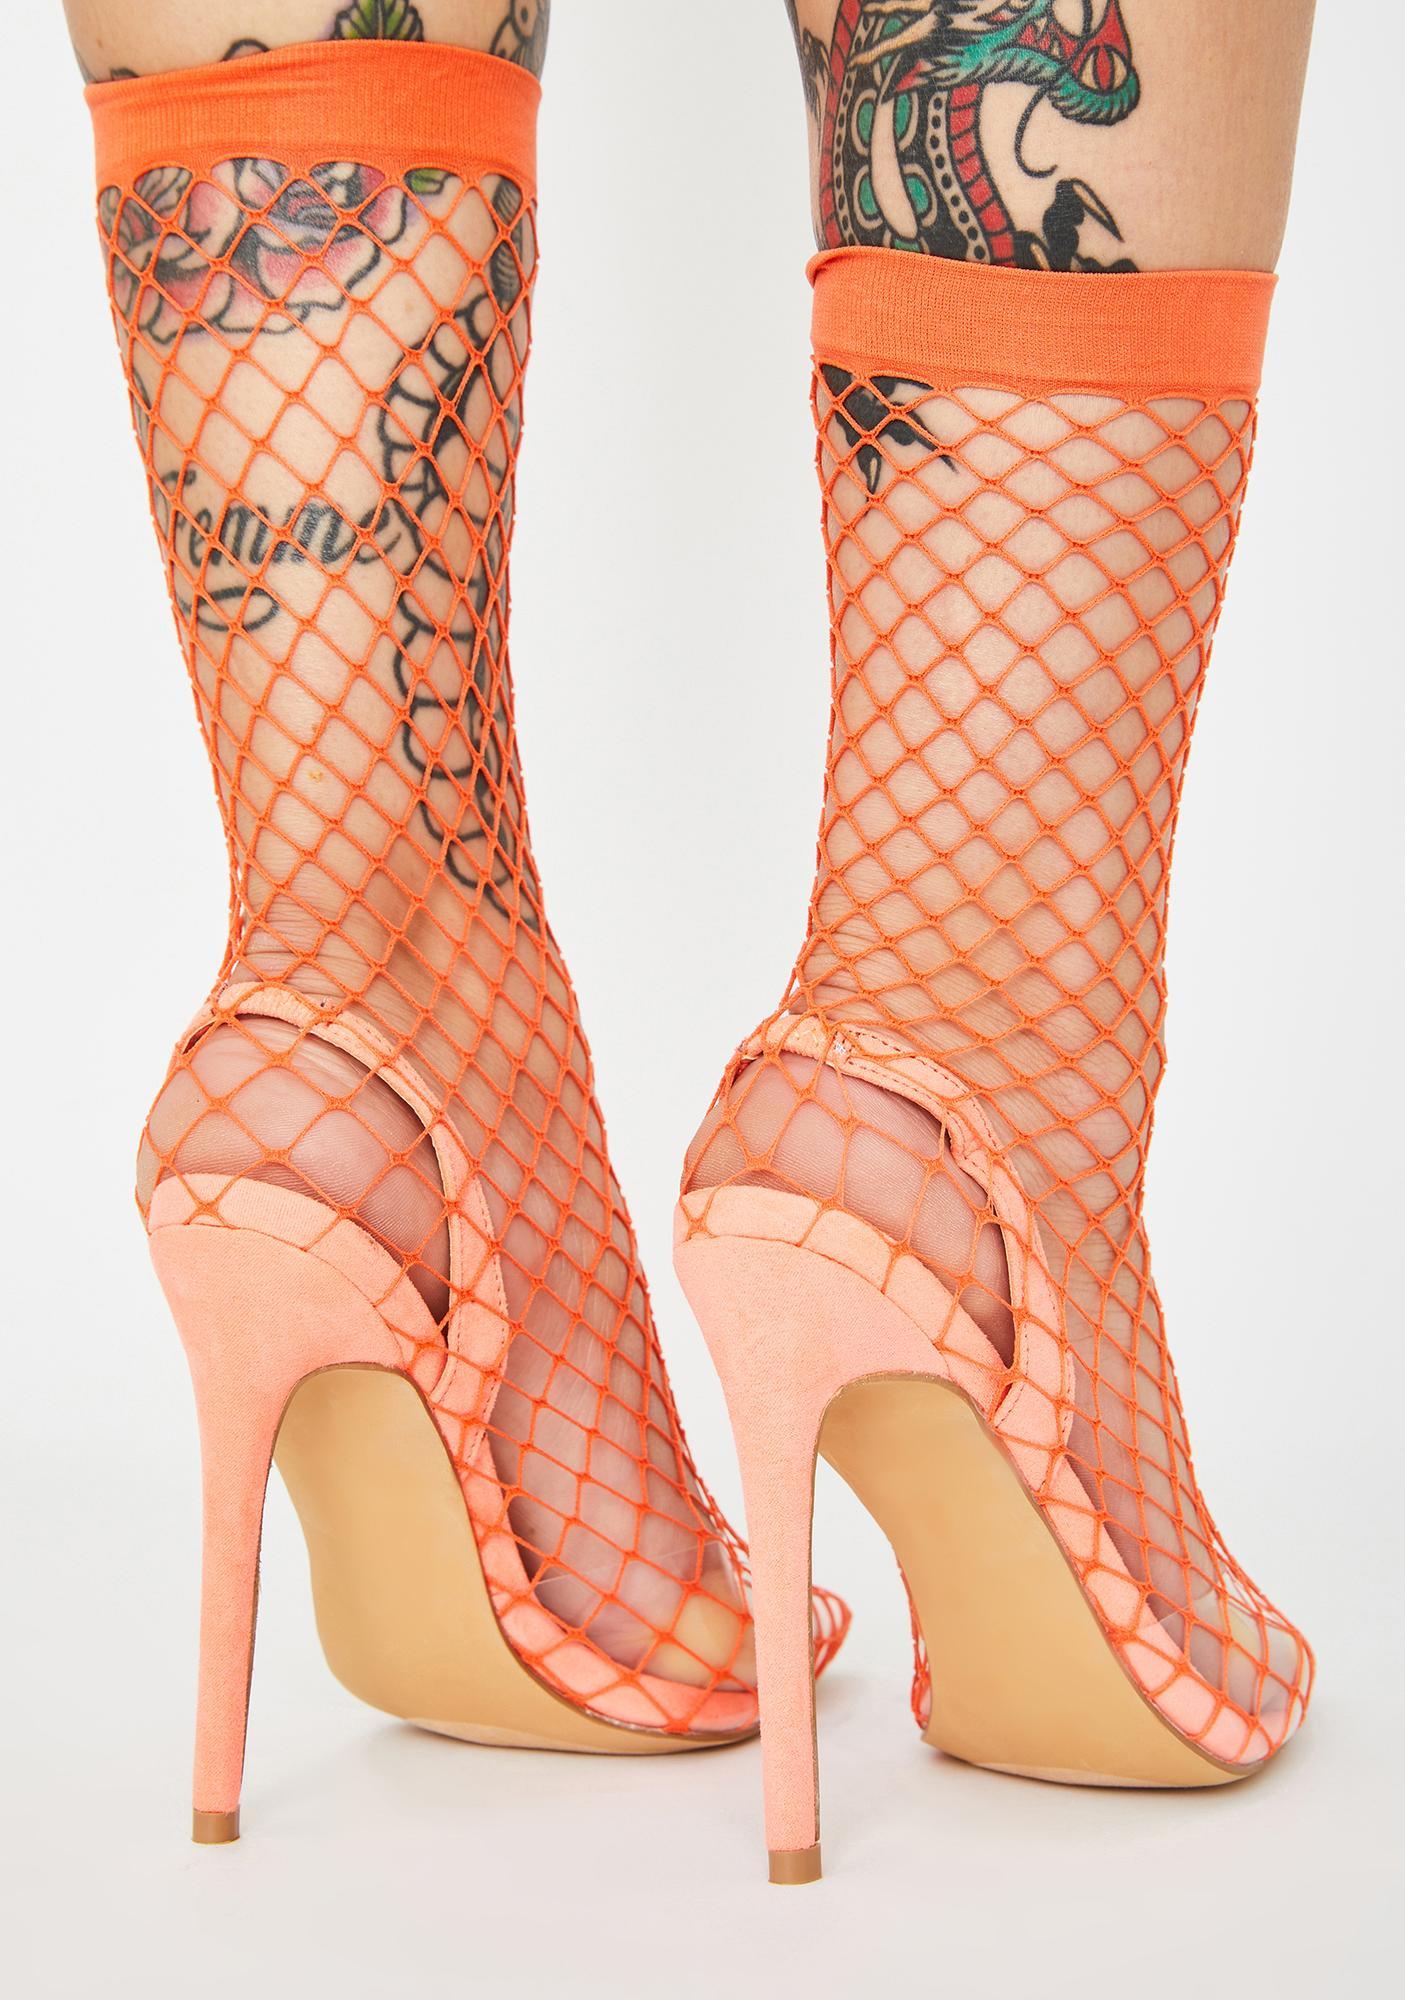 Amber The Hott Friend Fishnet Heels